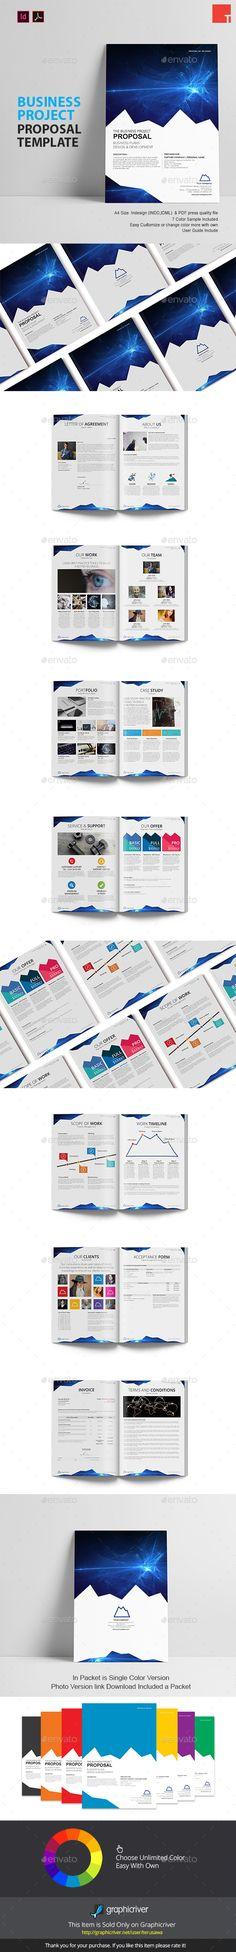 Daleman Business Proposal Pinterest Business proposal, Proposals - purchase proposal templates